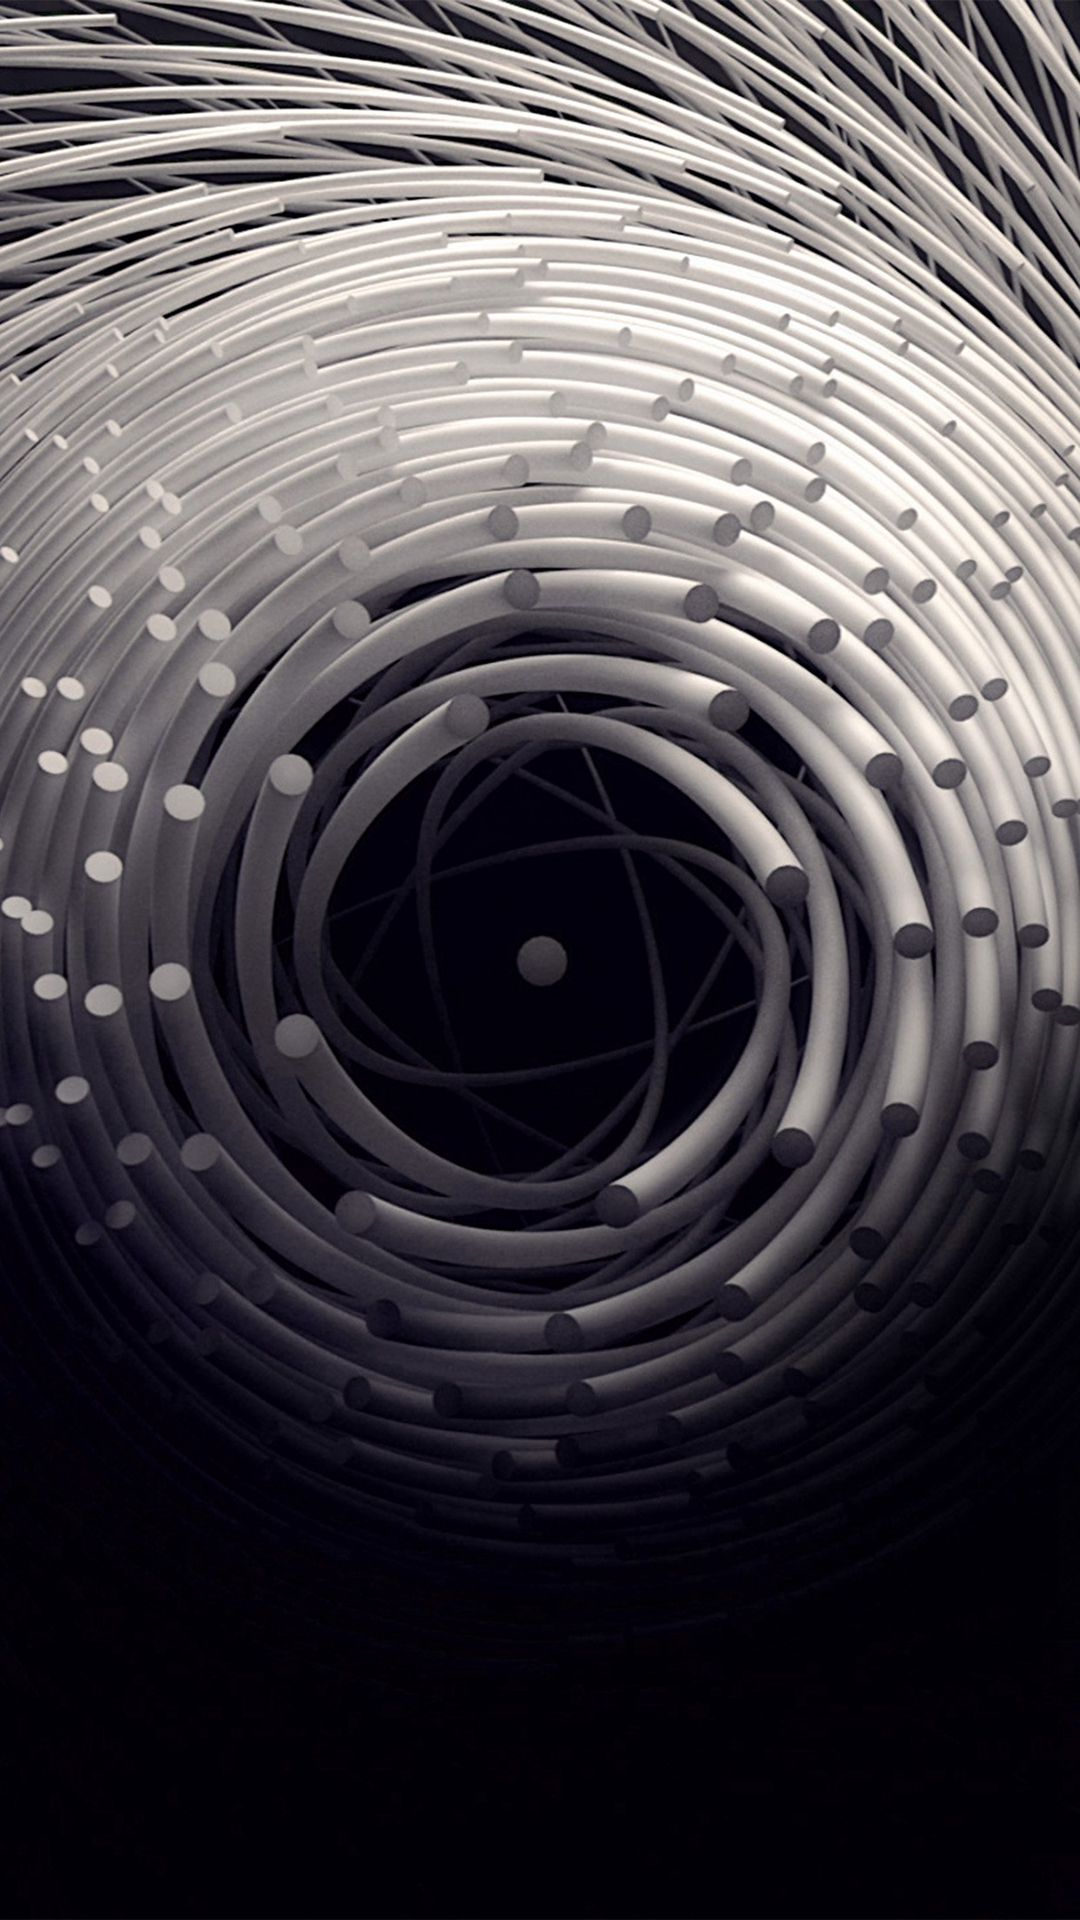 Free download Circle 3D Dark Abstact Iillustration Art iPhone 8